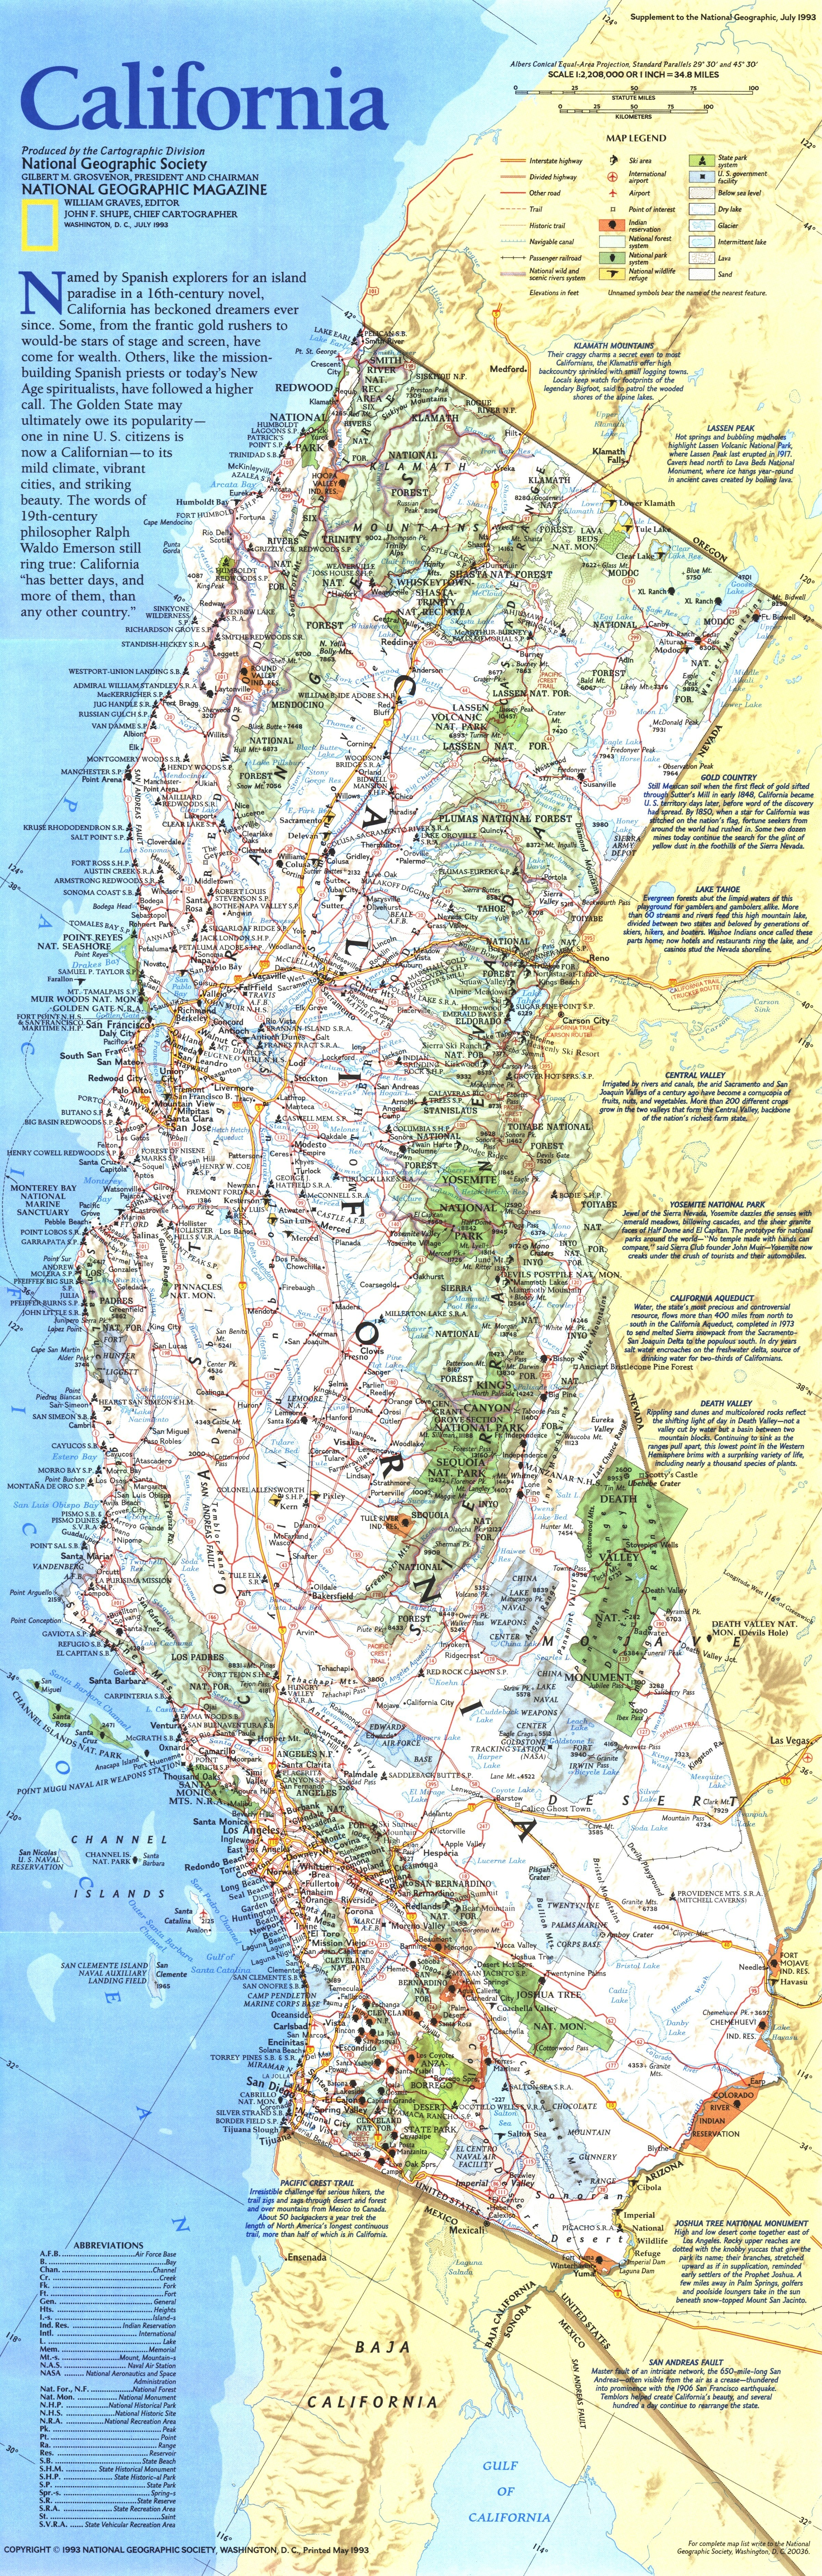 National Geographic California Map 1993 17 California Geographic Map - National Geographic Maps California